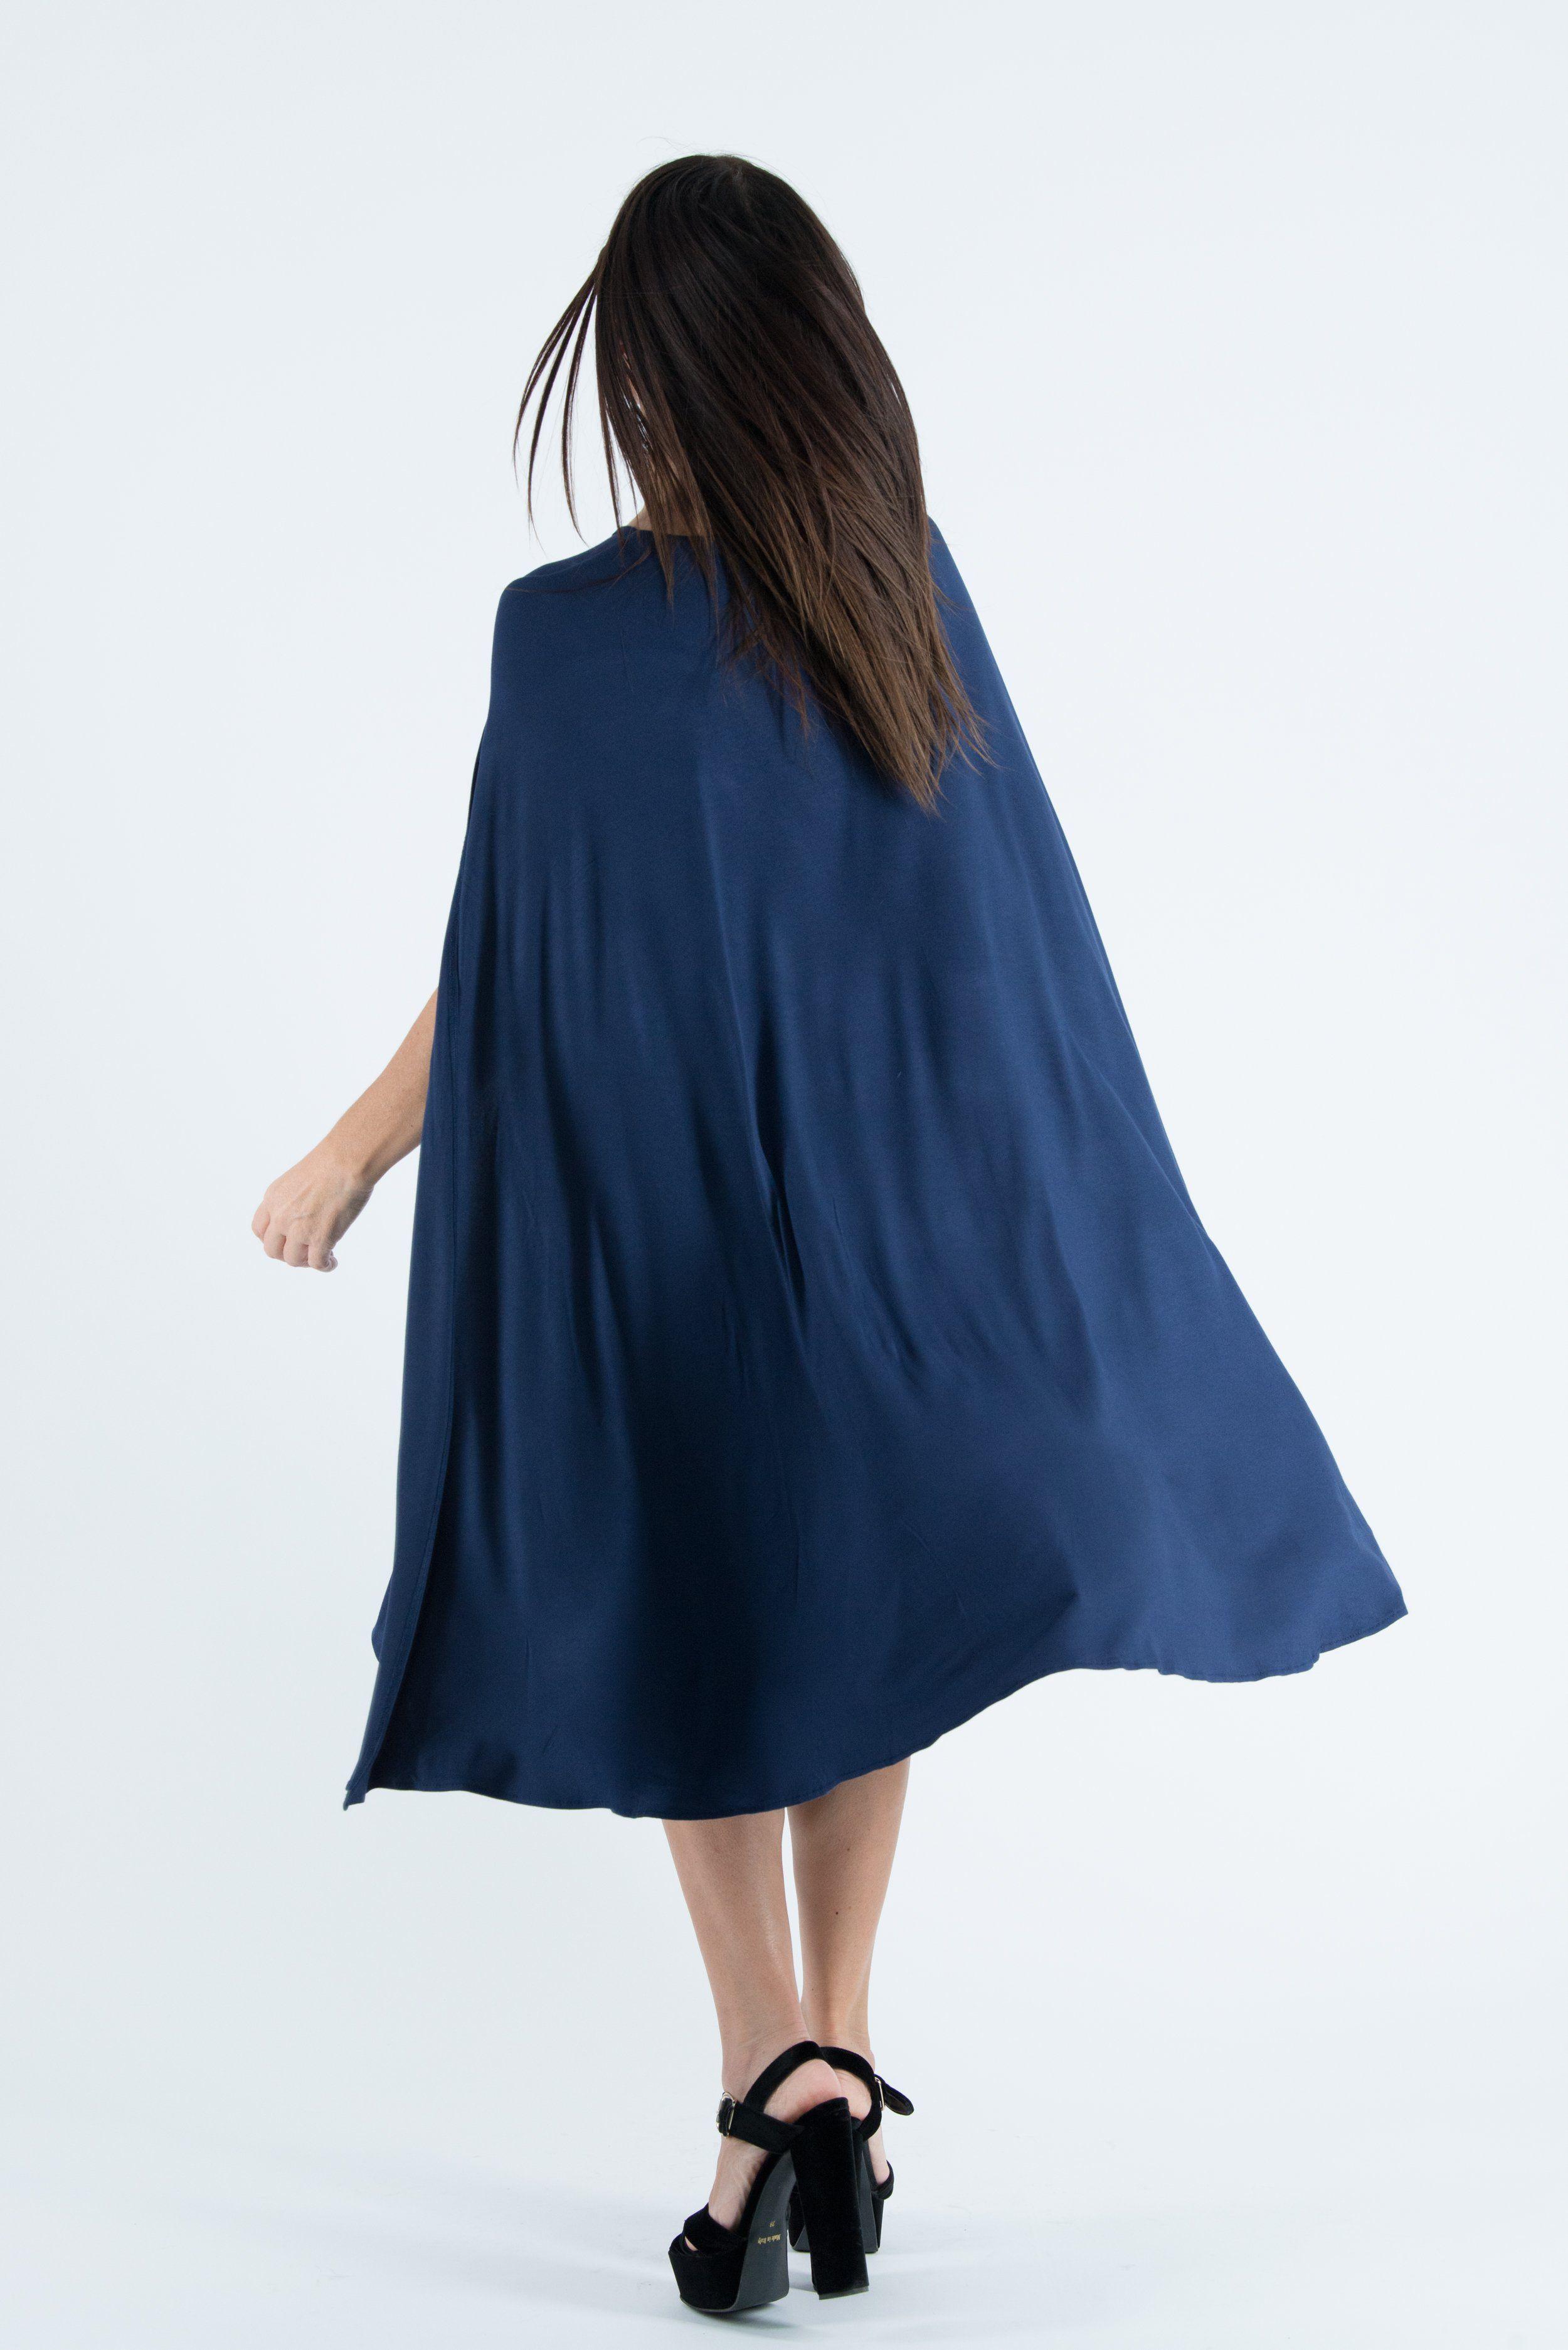 Navy Blue Summer Short Dress